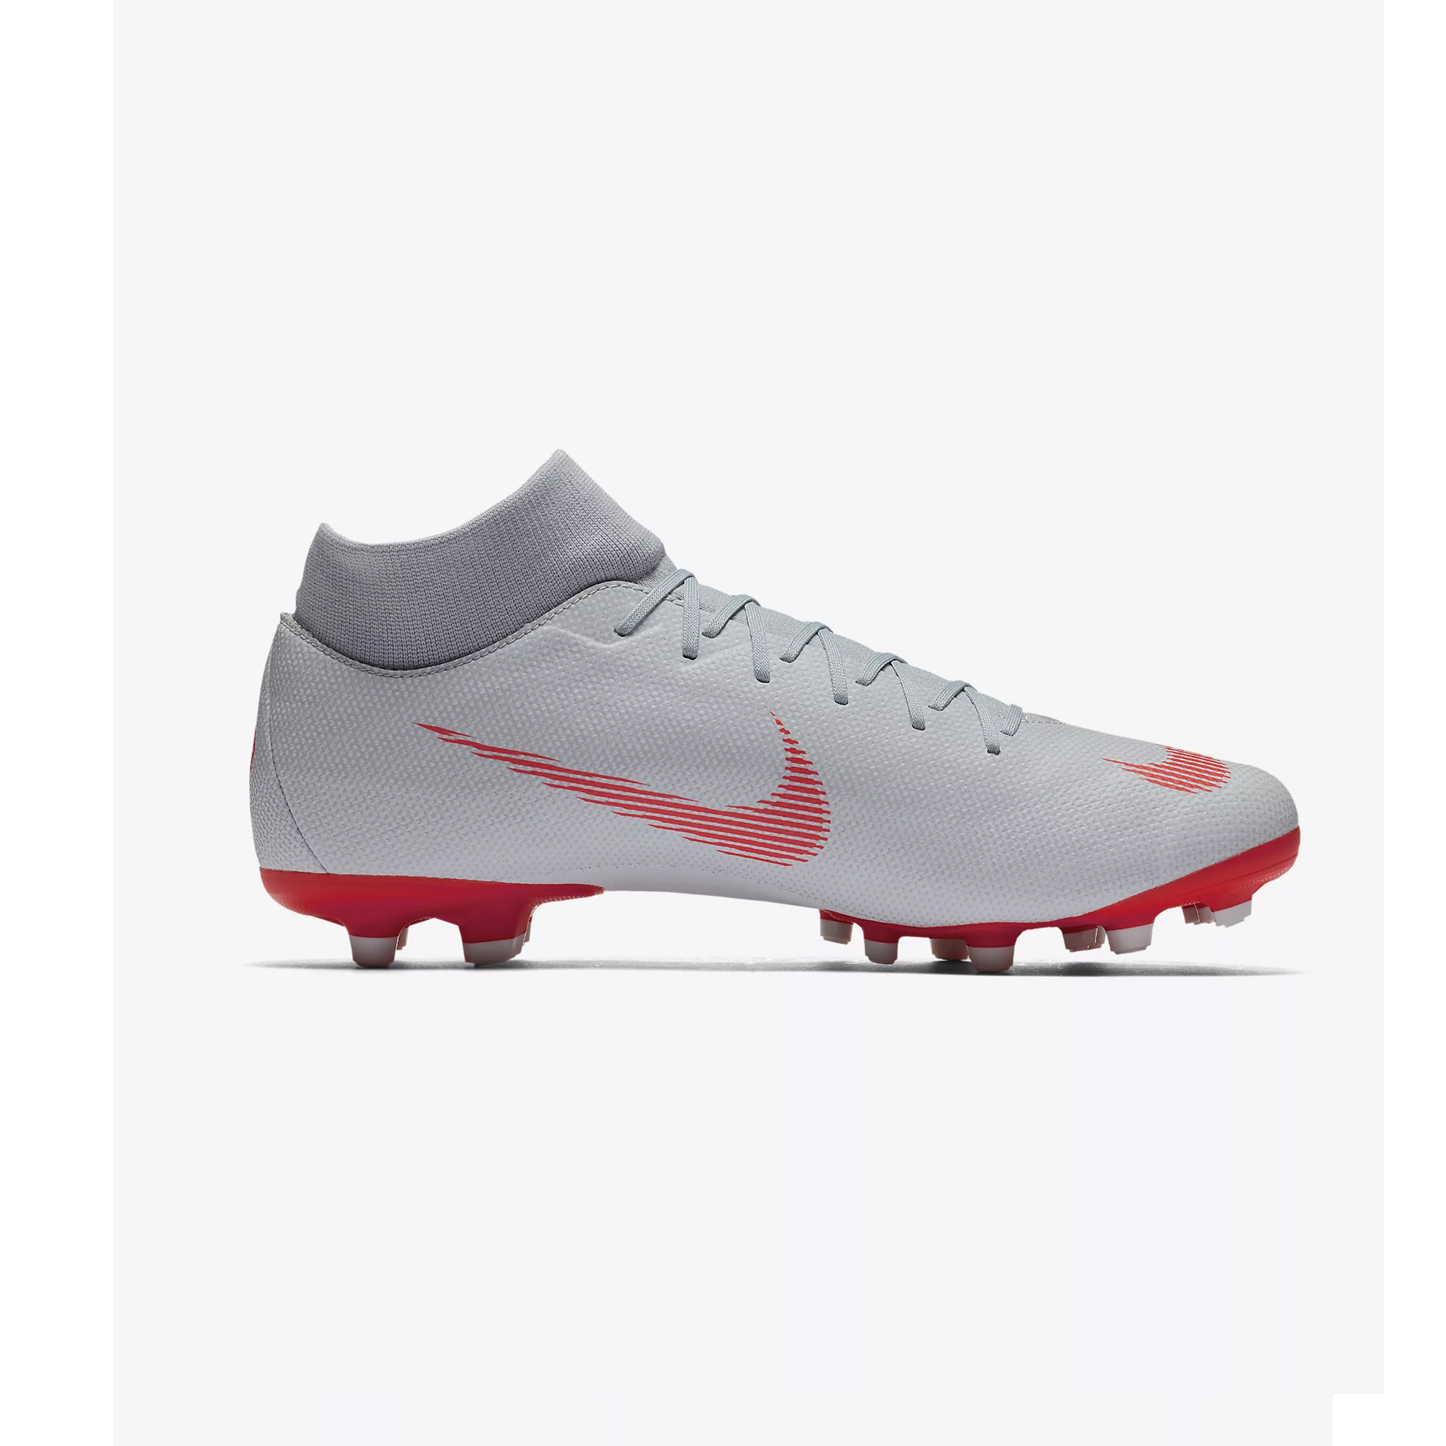 a30dd5f3538d Nike Mens Mercurial Superfly VI Academy Multi Ground Football Boot Wolf Grey